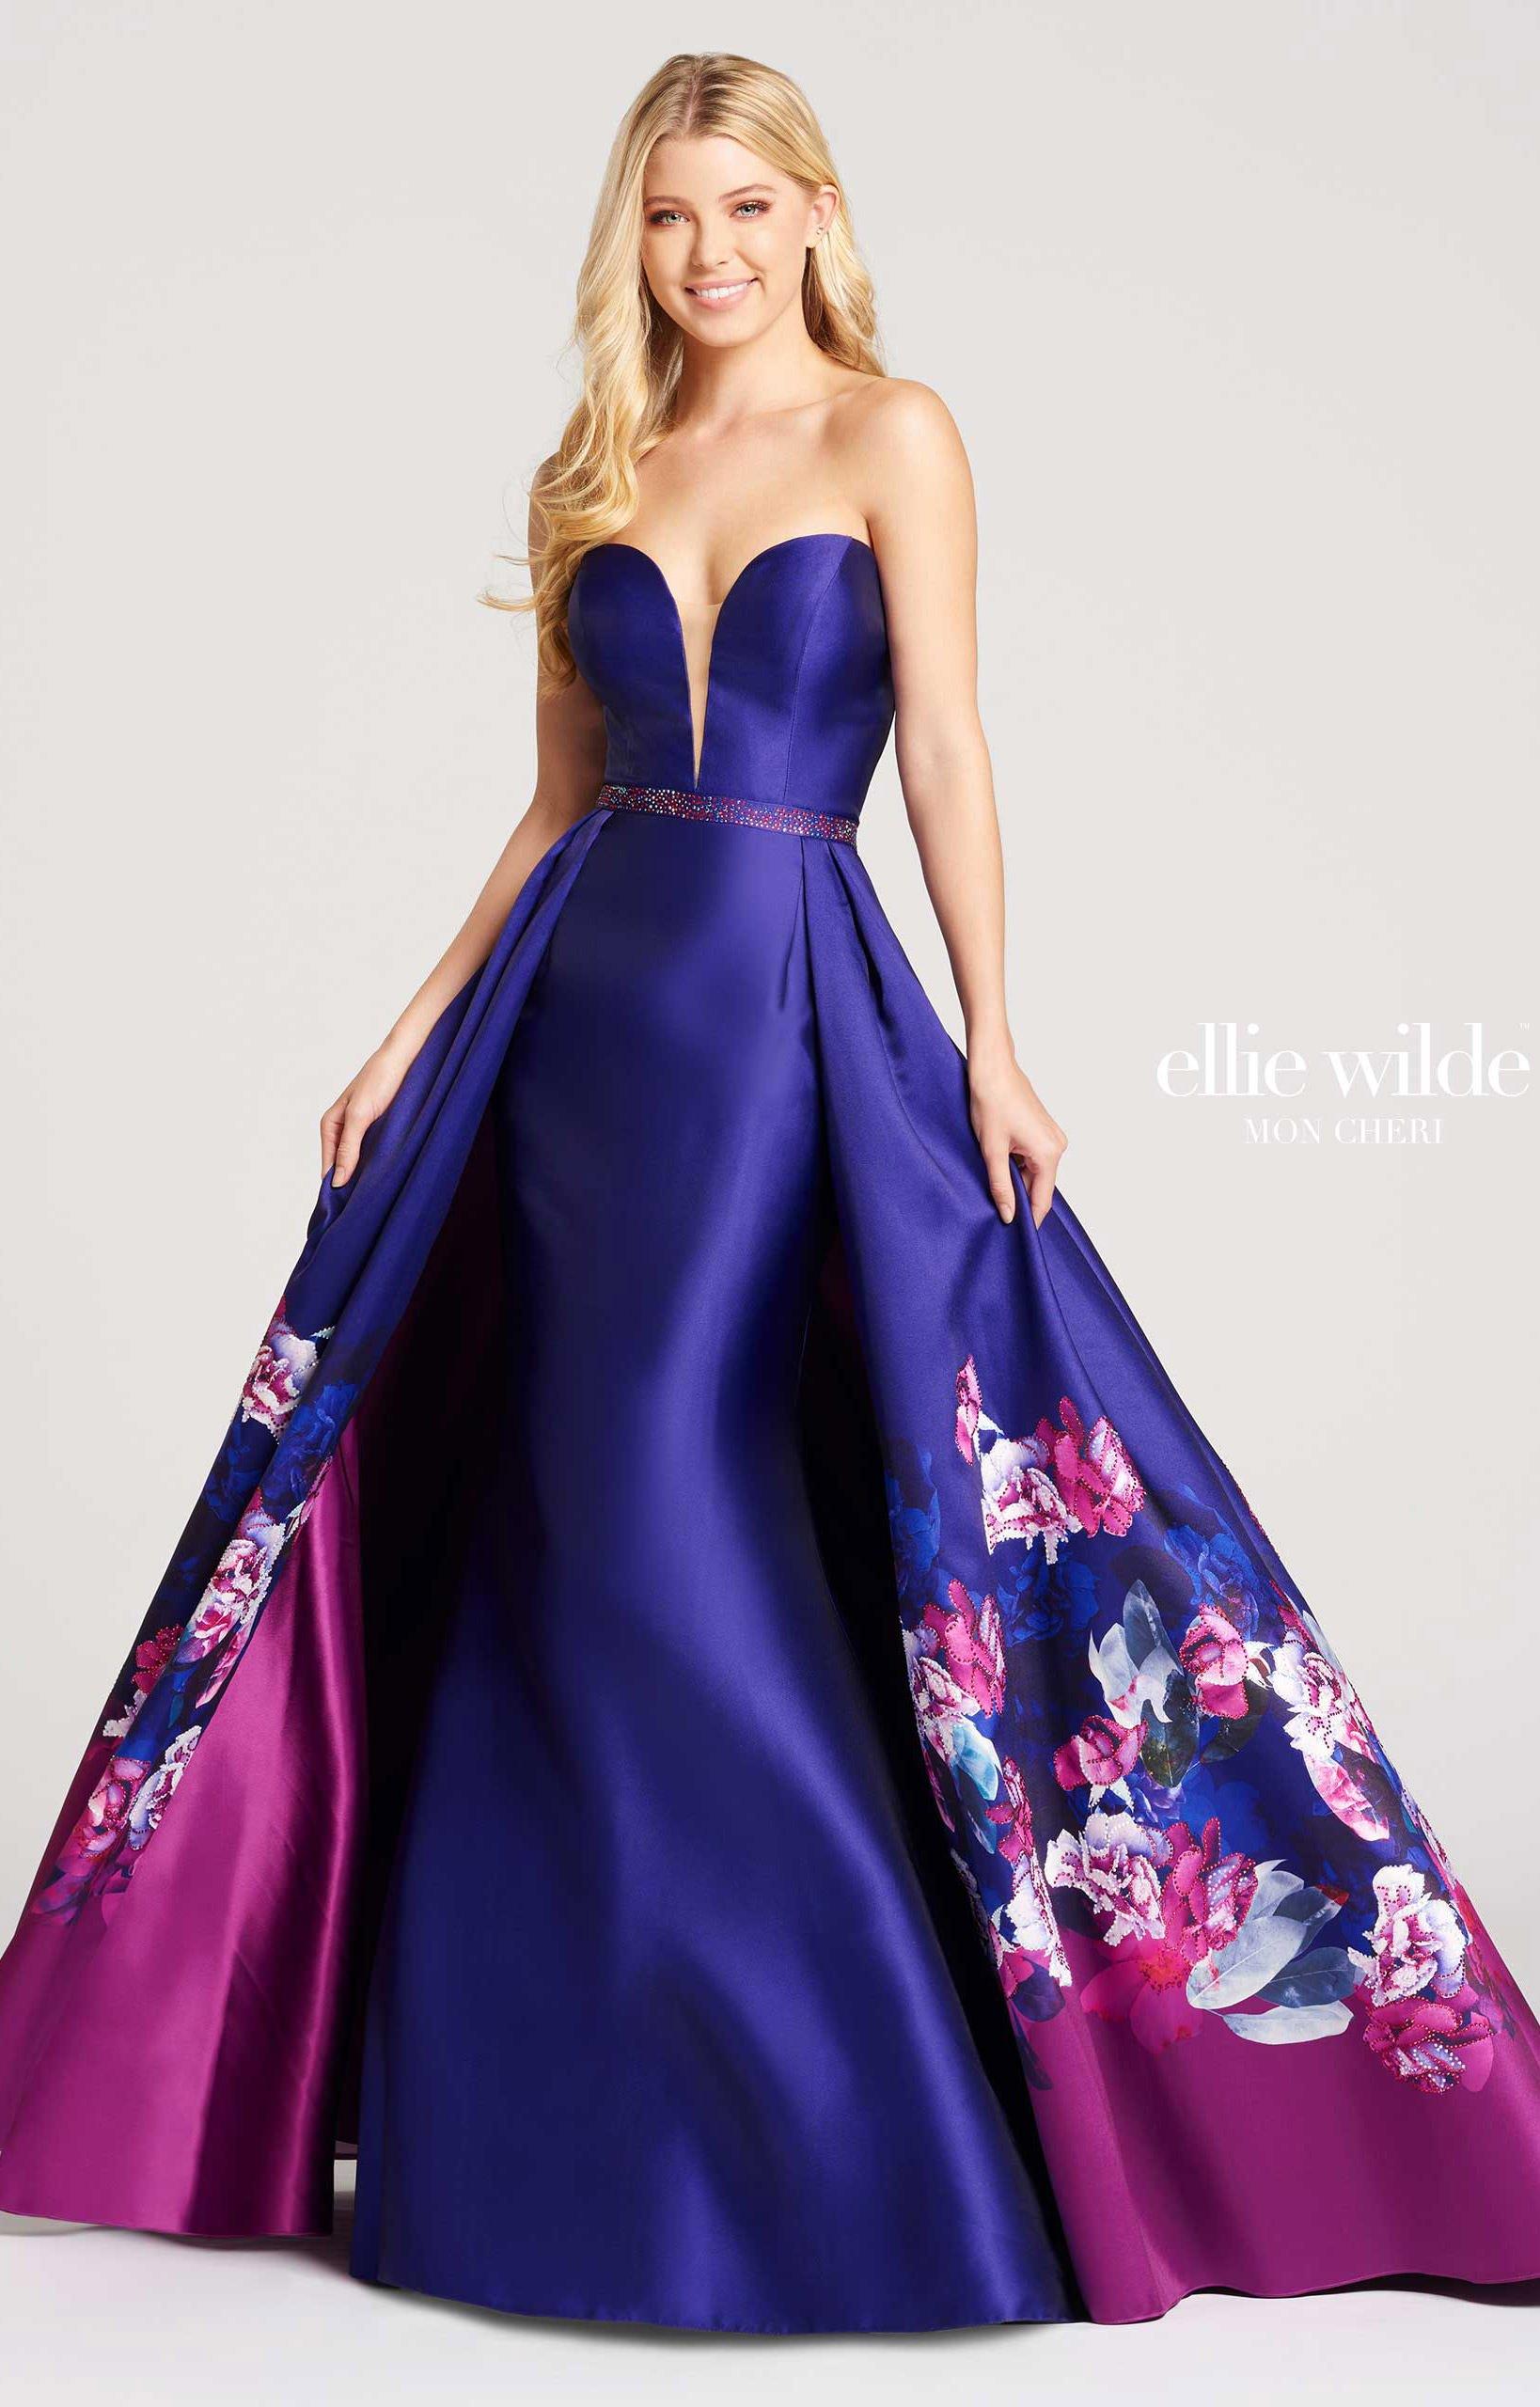 Ellie Wilde EW118014 - Sweetheart Strapless Mermaid Cape Dress Prom ...